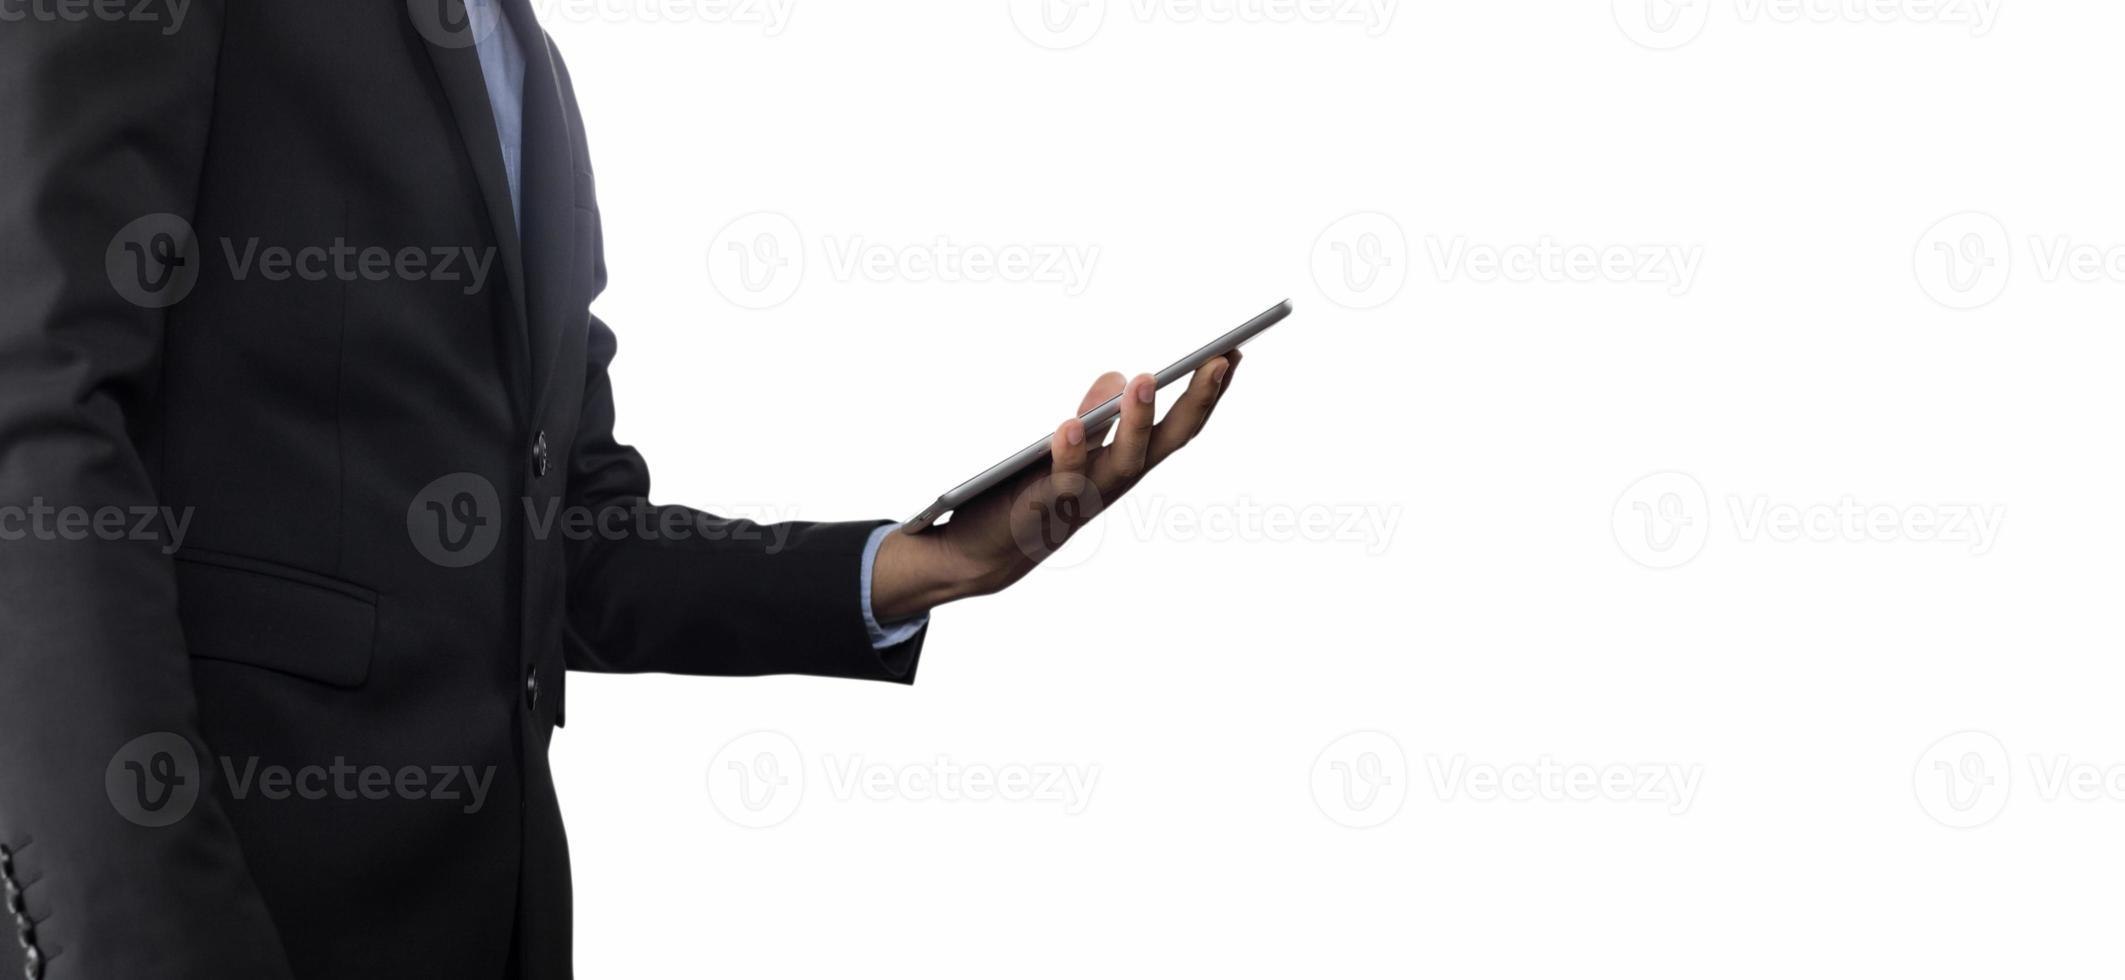 persoon met tablet op witte achtergrond foto